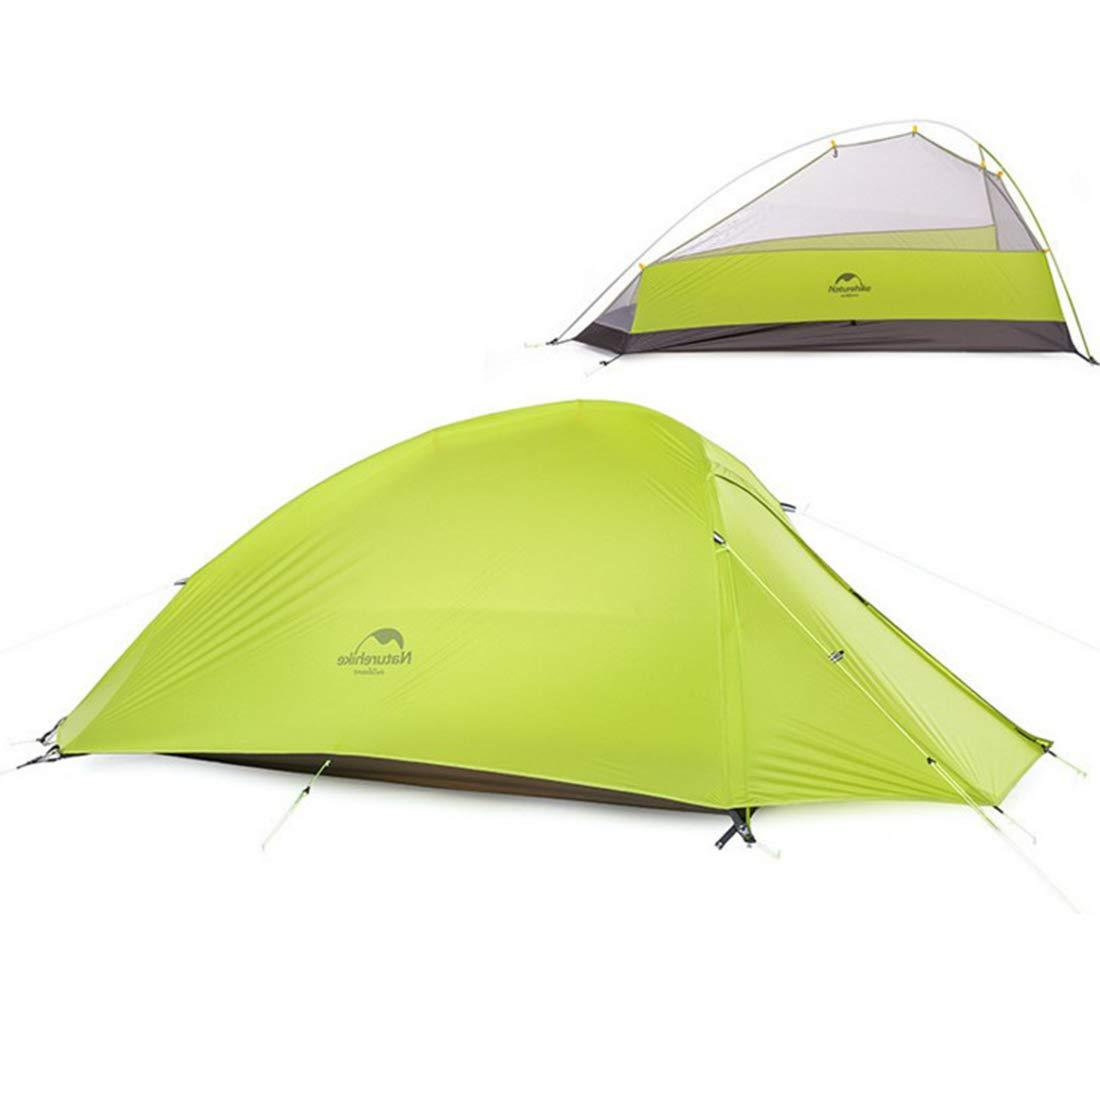 LilyAngel 一人用キャンプテント4シーズンダブルレインプロテクションバックパッキングテント屋外スポーツのために組み立てられる必要があります、ハイキング、釣り、キャンプ  A004 B07MXG1LHG